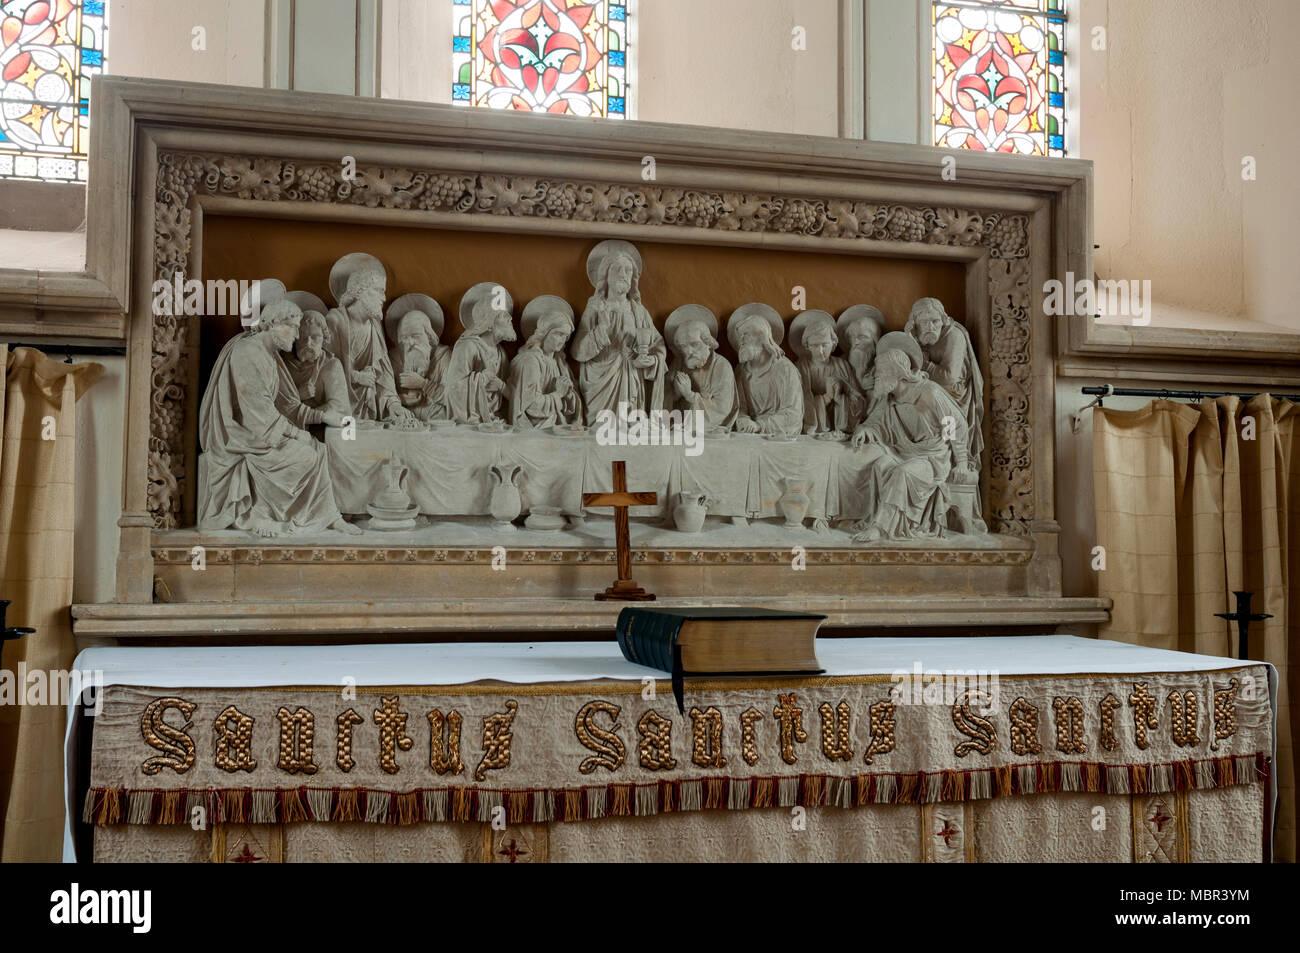 Last Supper reredos and altar, St. Mary the Virgin Church, Marsh Gibbon, Buckinghamshire, England, UK Stock Photo